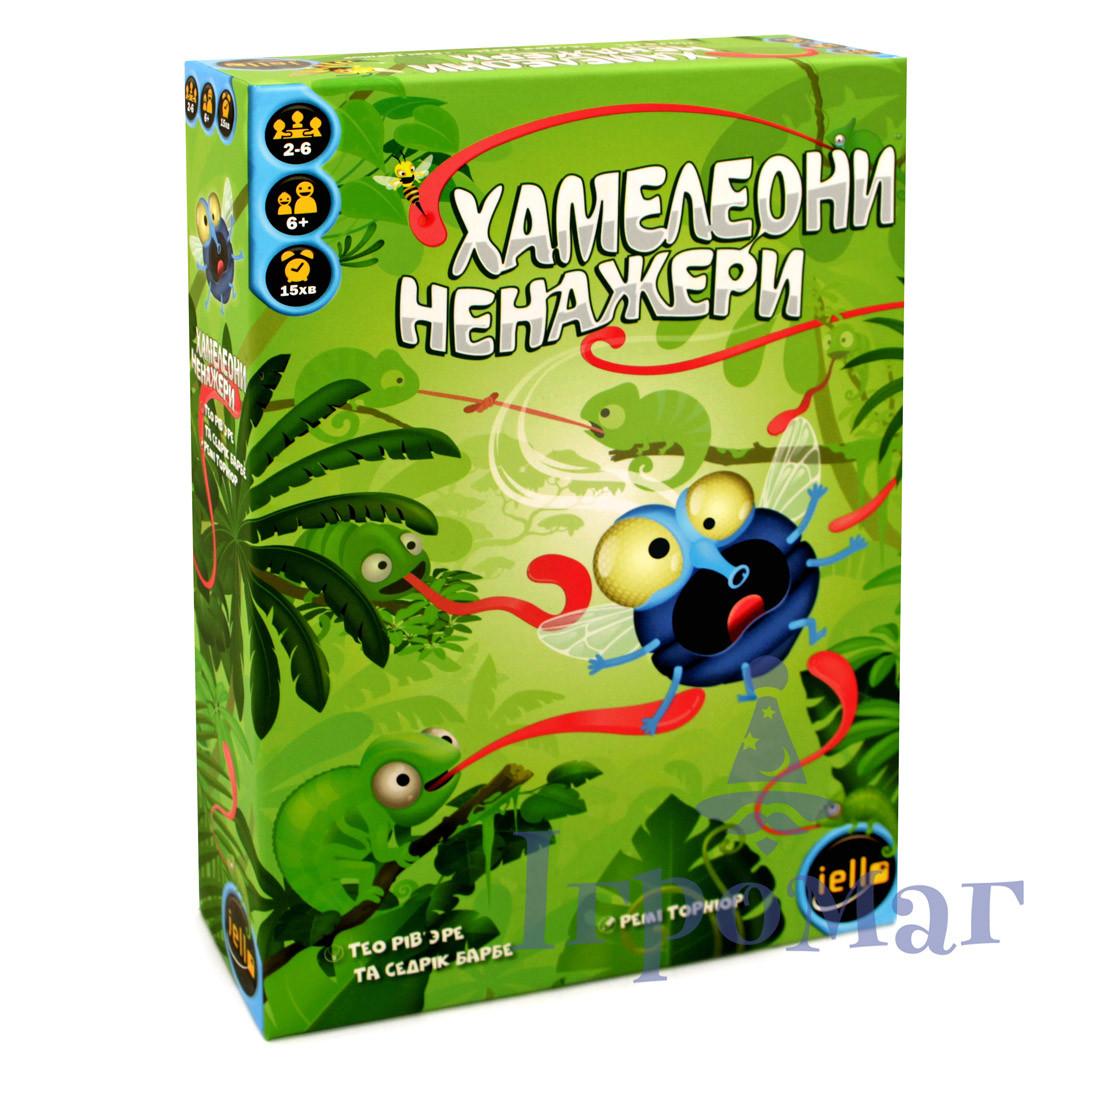 Настольная игра Хамелеони Ненажери (Липкие Хамелеоны, Sticky Chameleons)